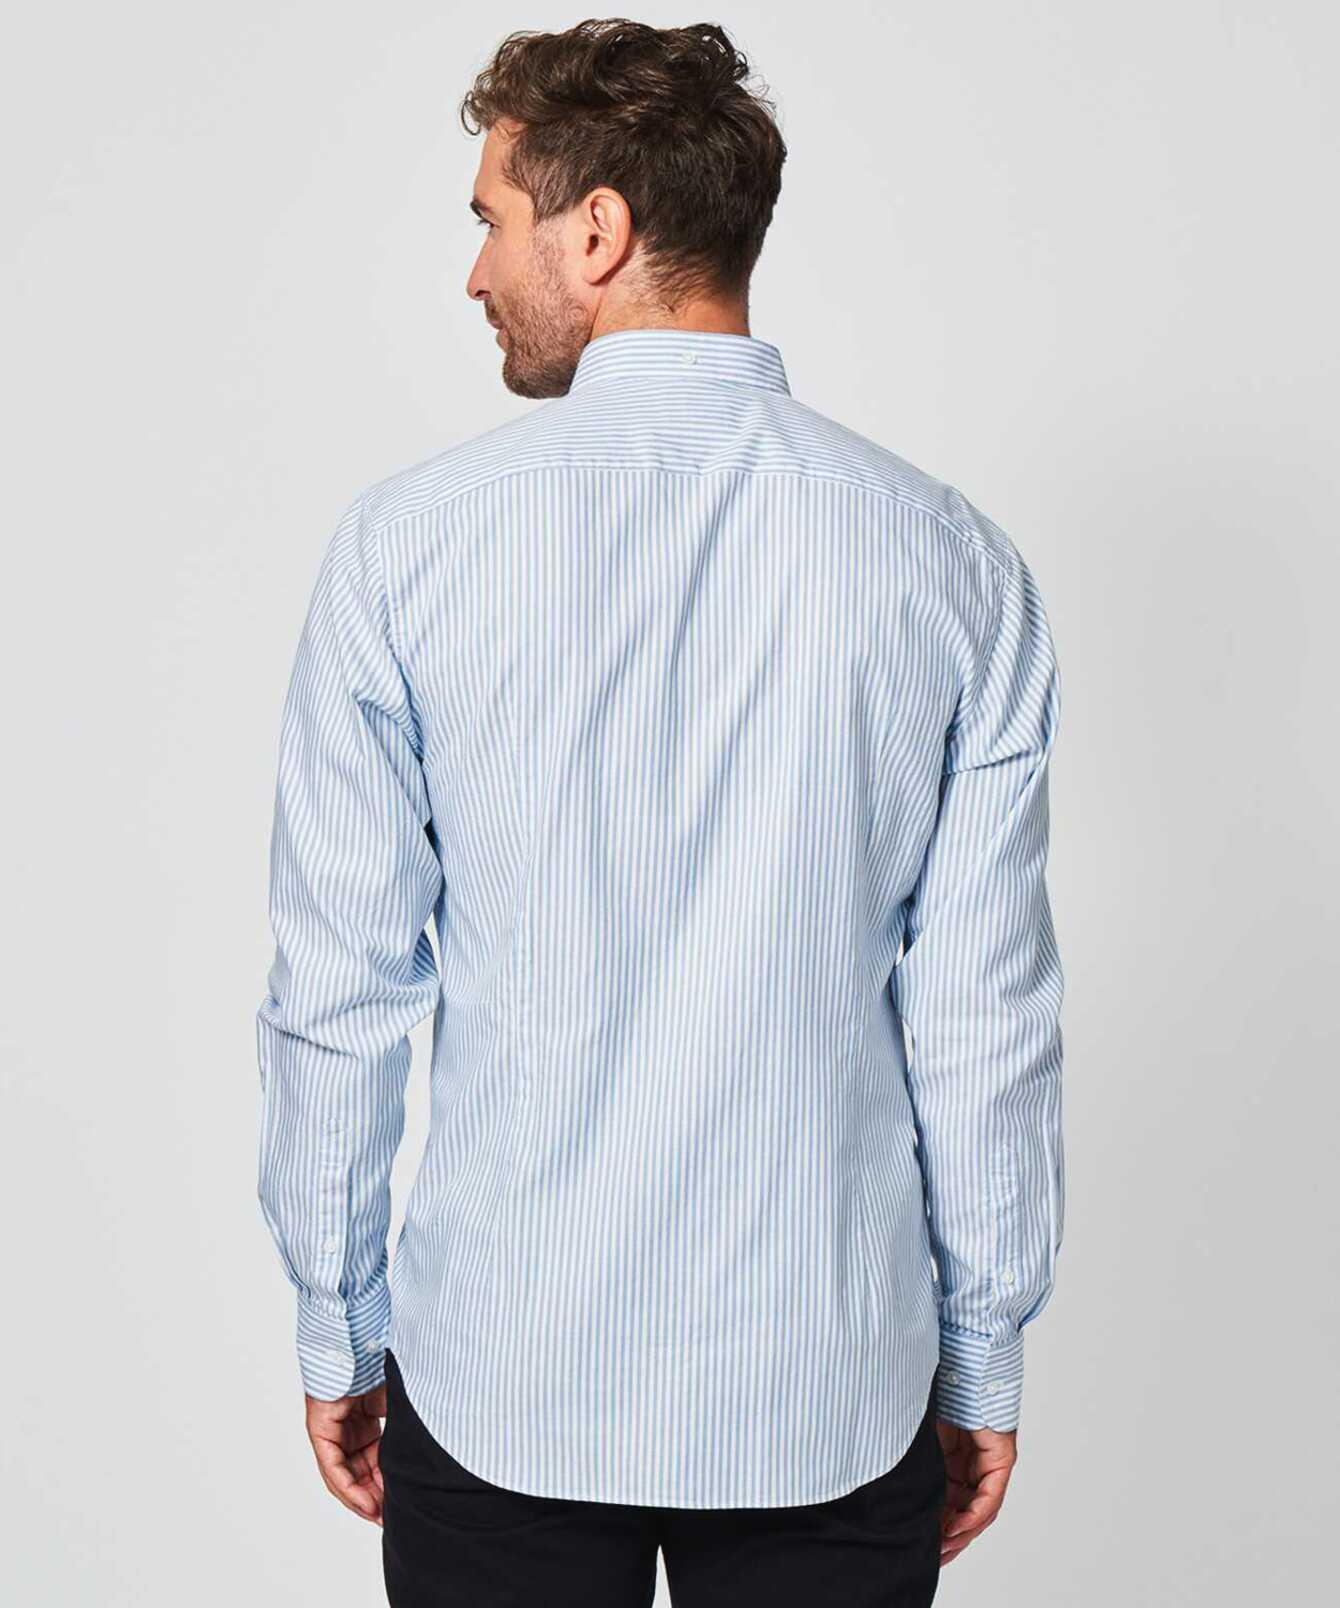 Shirt Oxford Stripe Blå The Shirt Factory